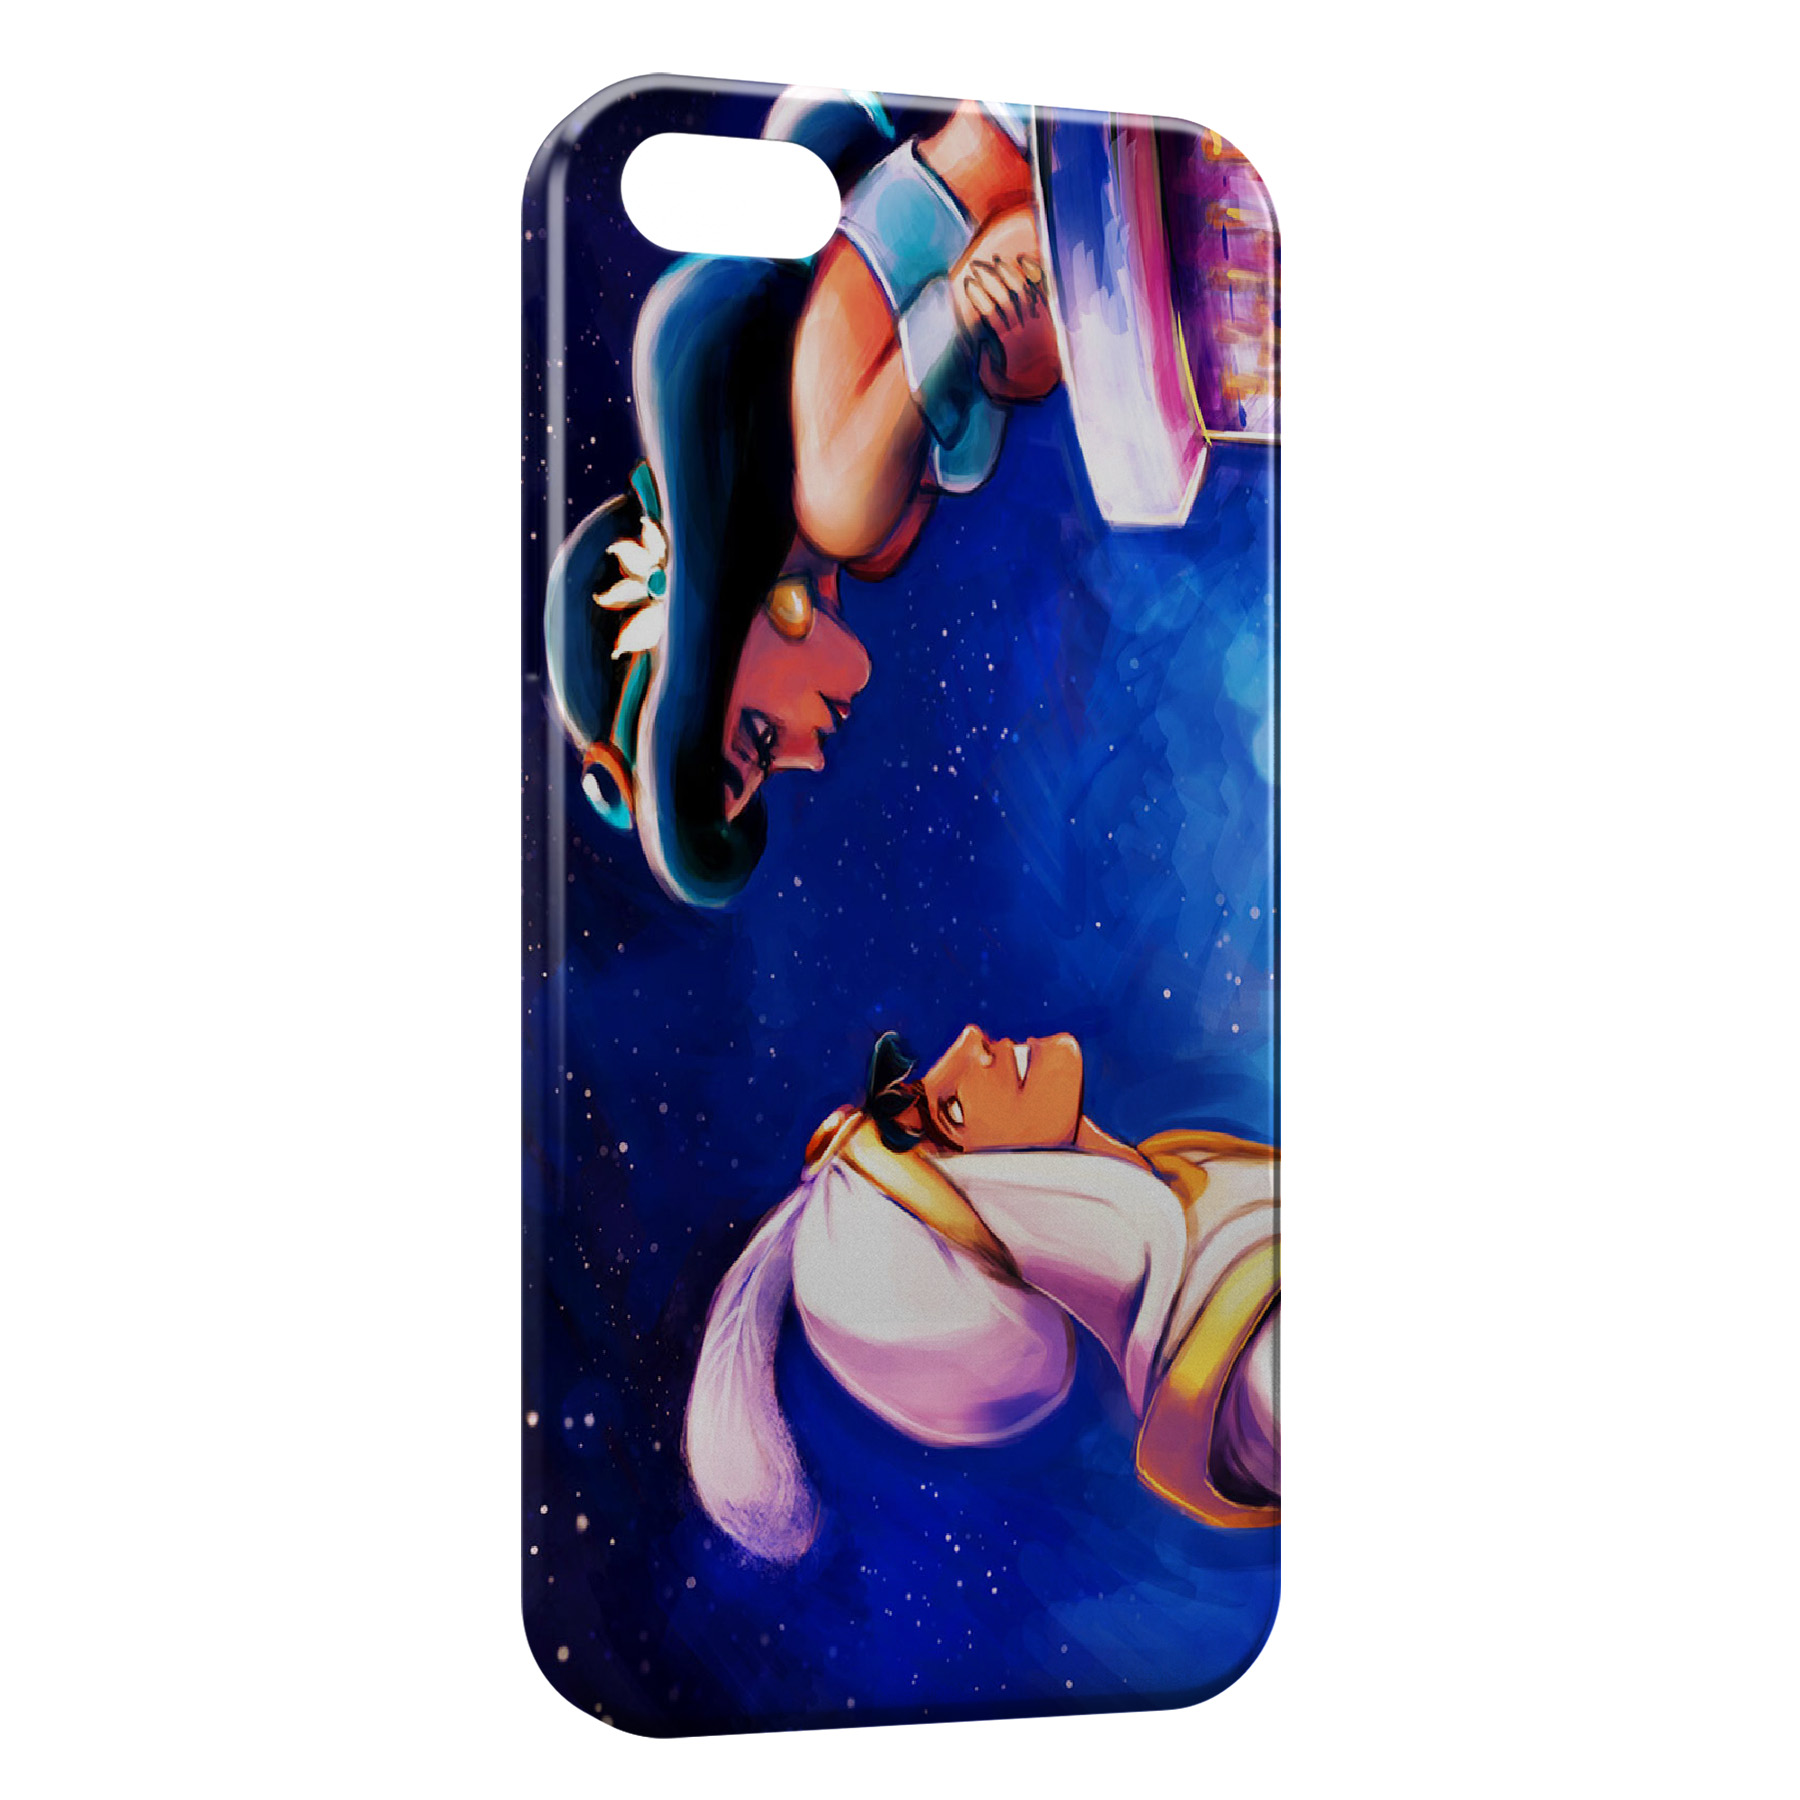 Coque iPhone 4 & 4S Jasmine et Aladdin